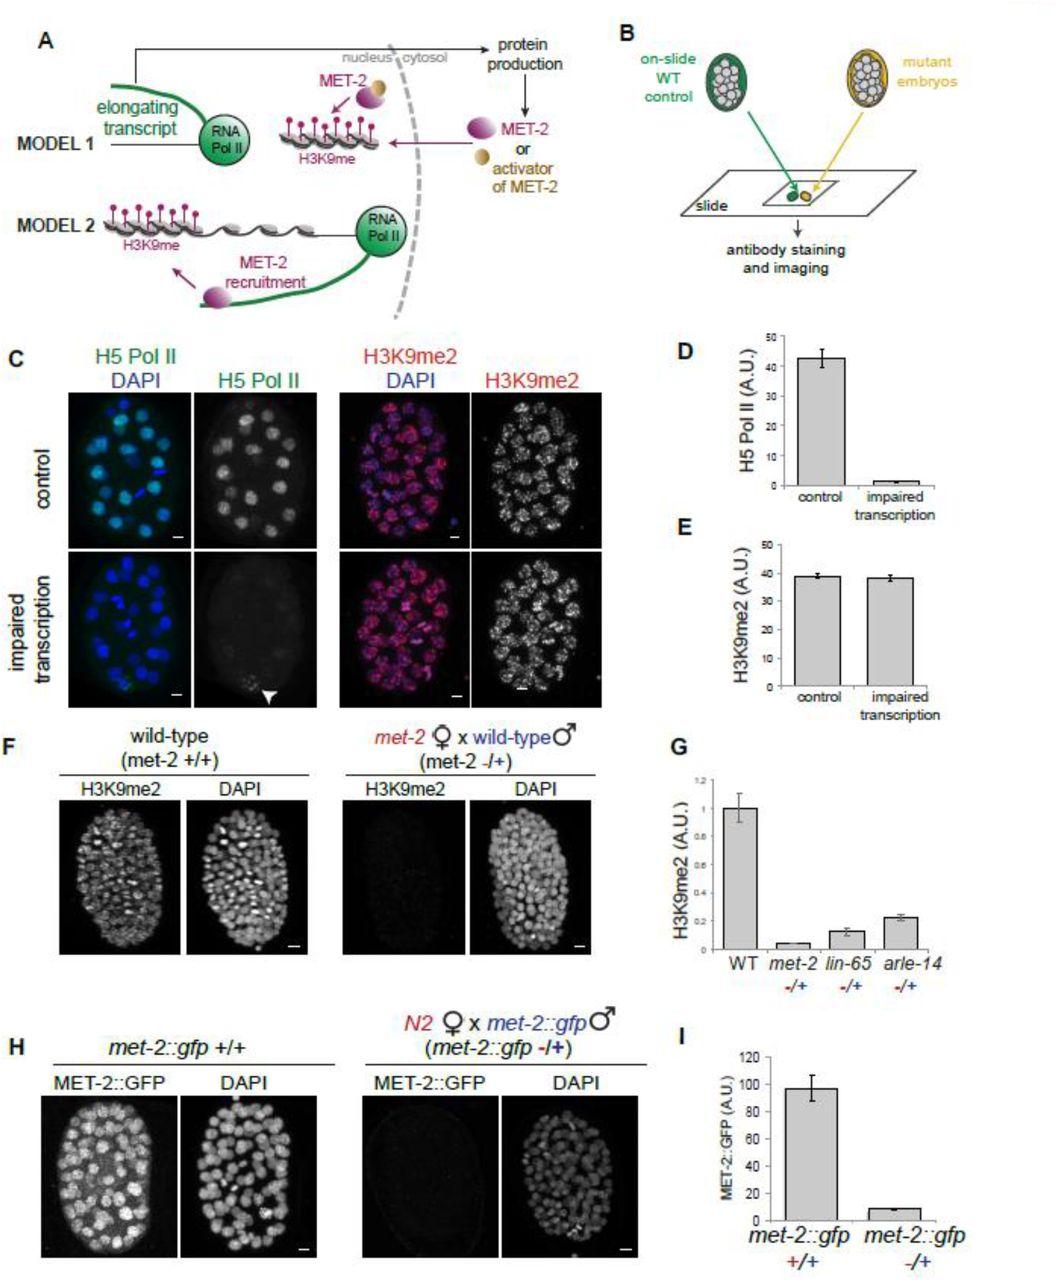 MET-2, a SETDB1 family methyltransferase, coordinates embryo events